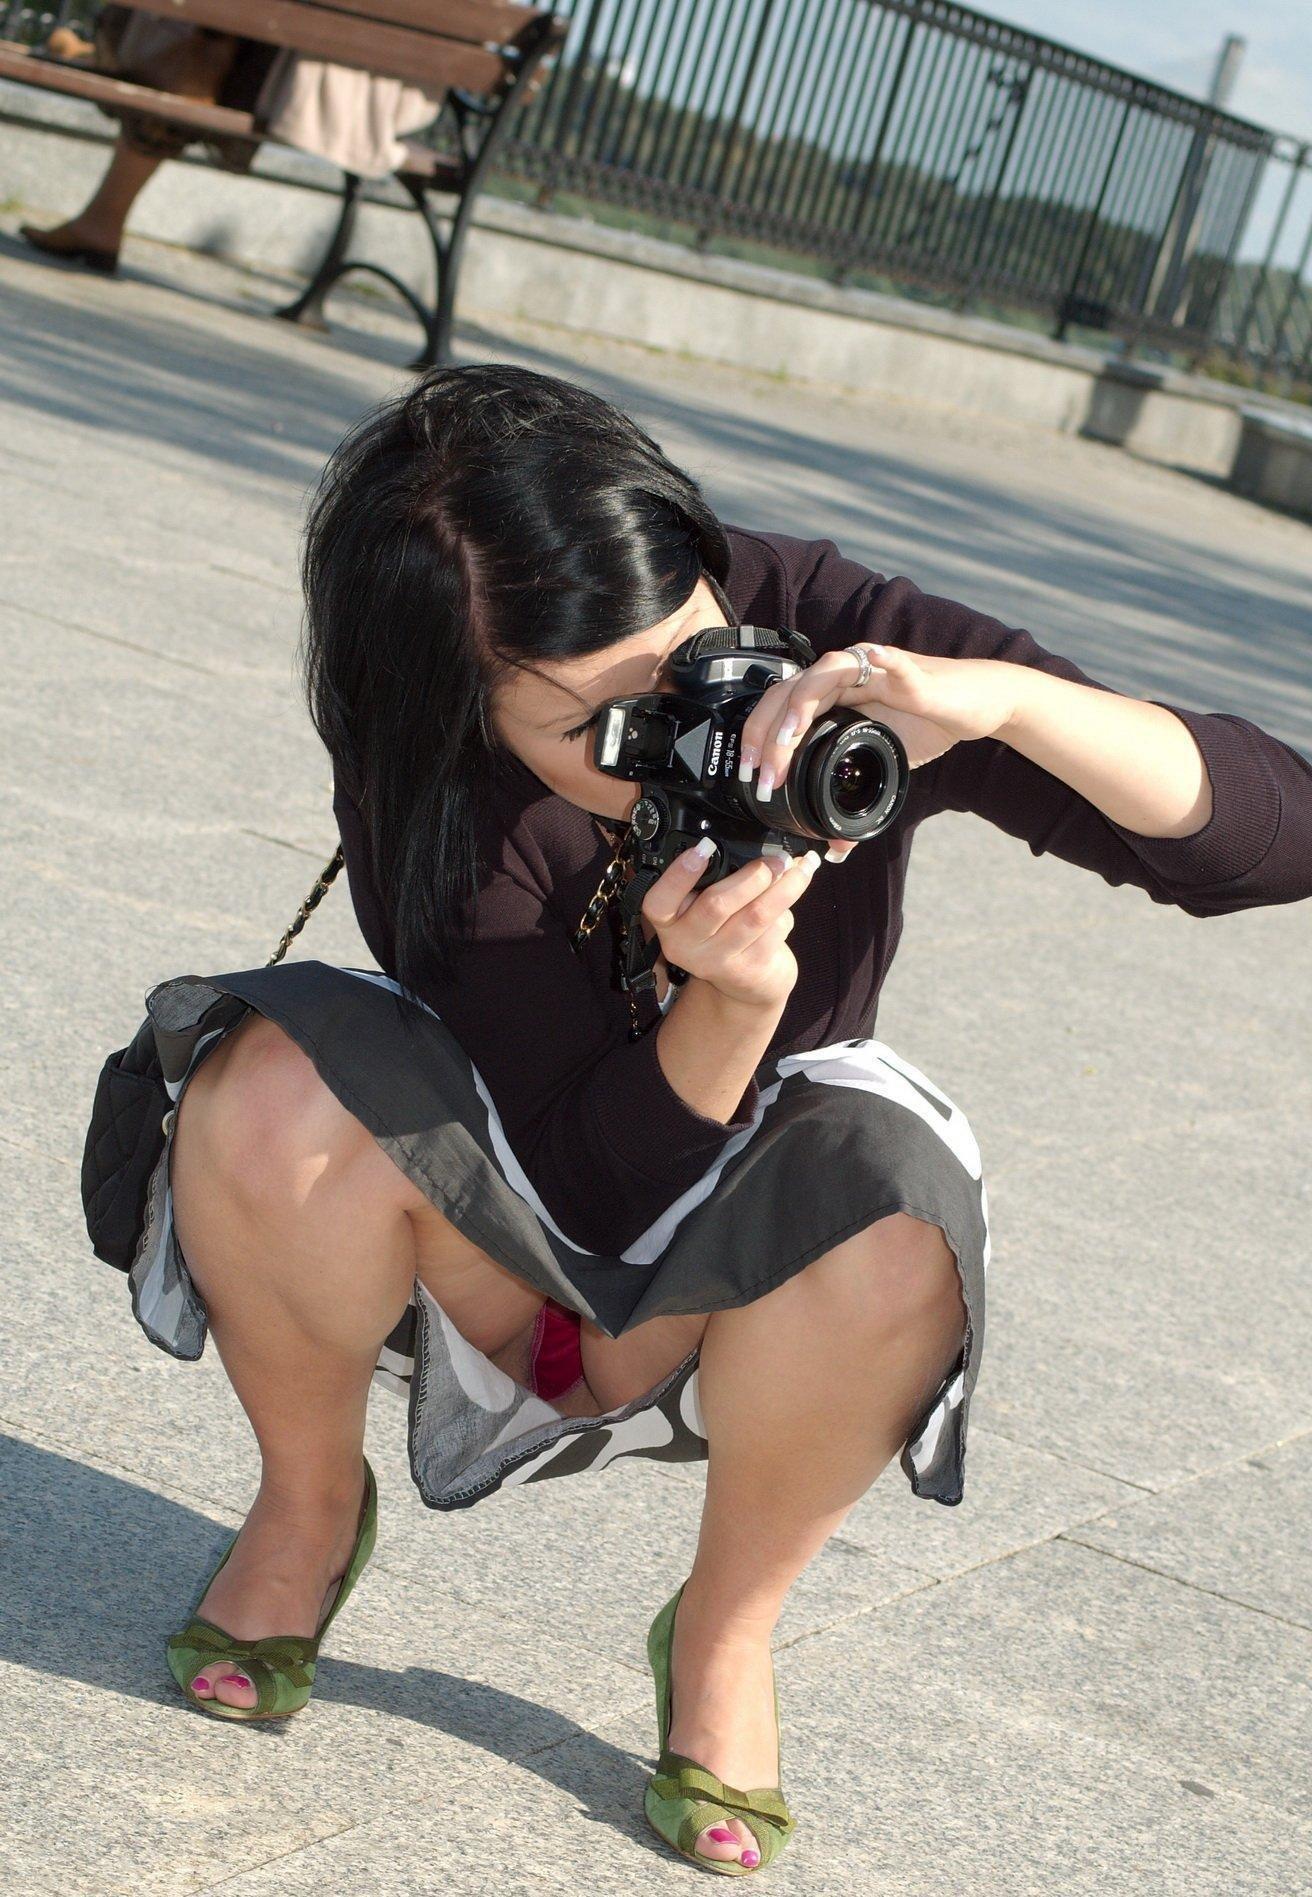 anala-bri-pod-yubkoy-u-fotografov-foto-bez-rezini